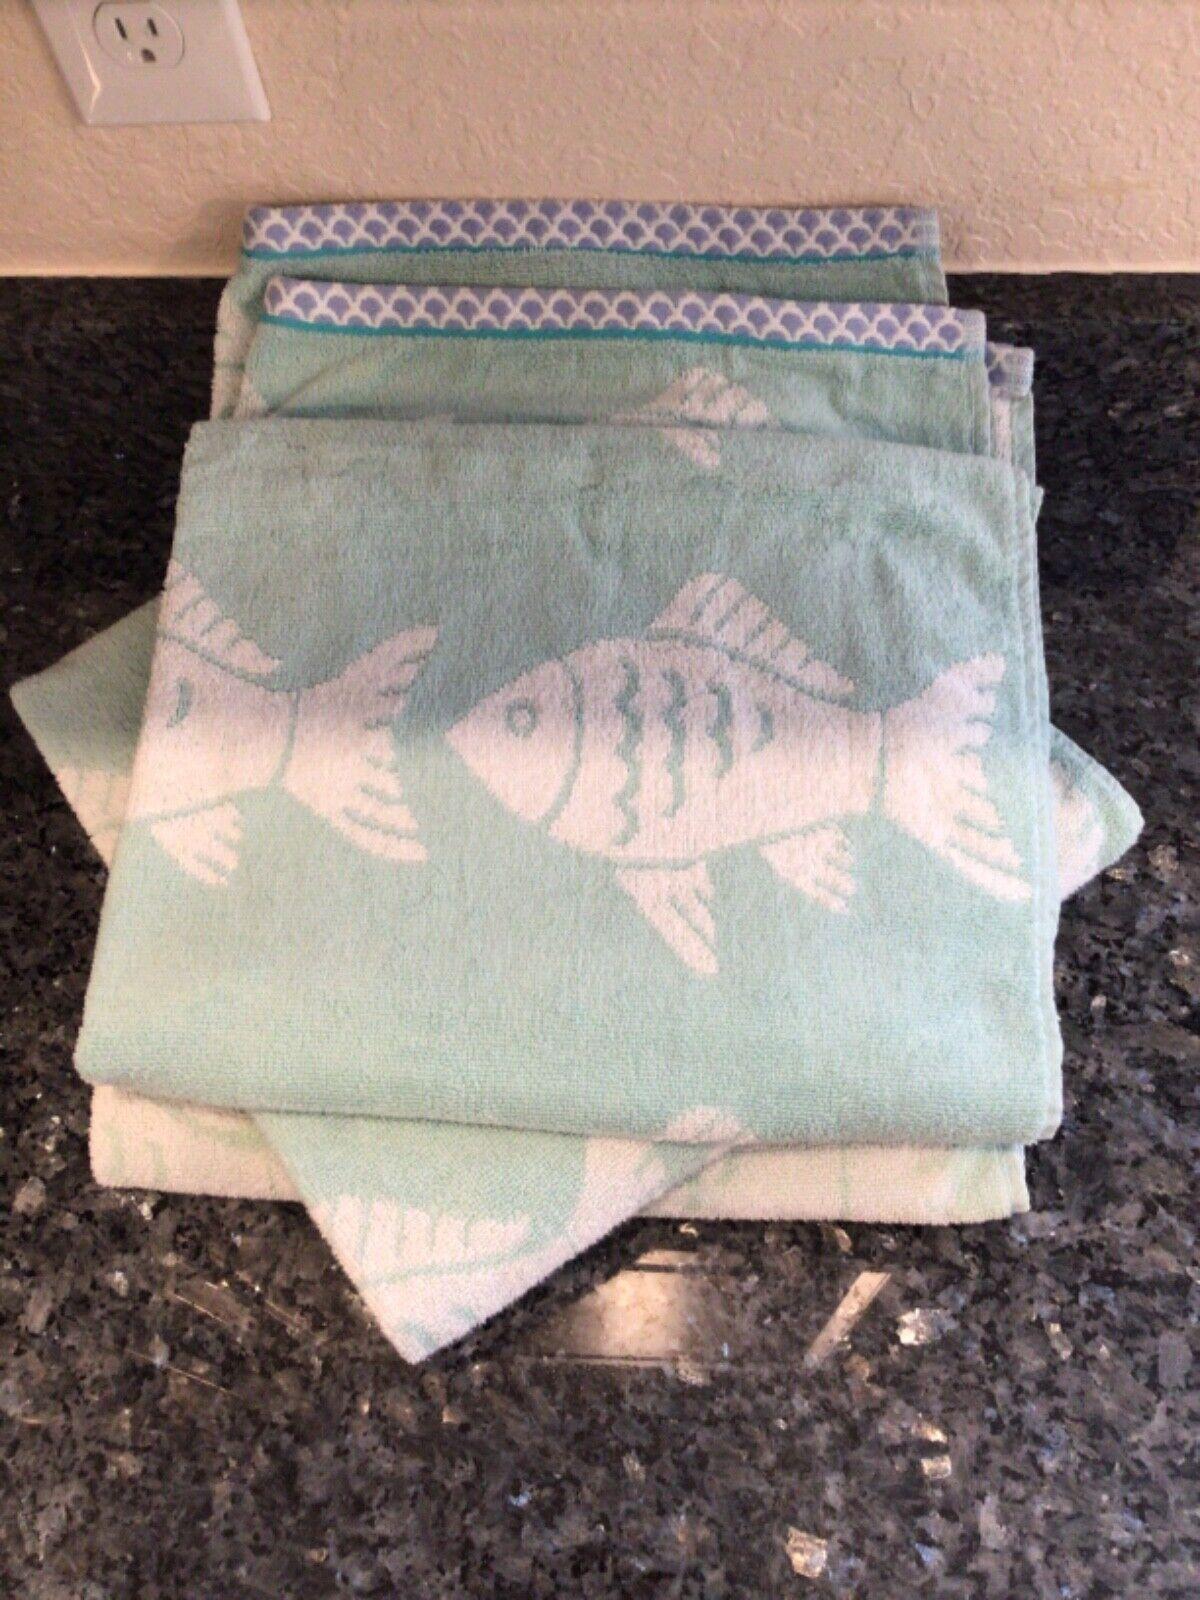 3 Kingsley Home 100% Cotton BathTowels Fish Pattern Mint Green Blue Shell Trim